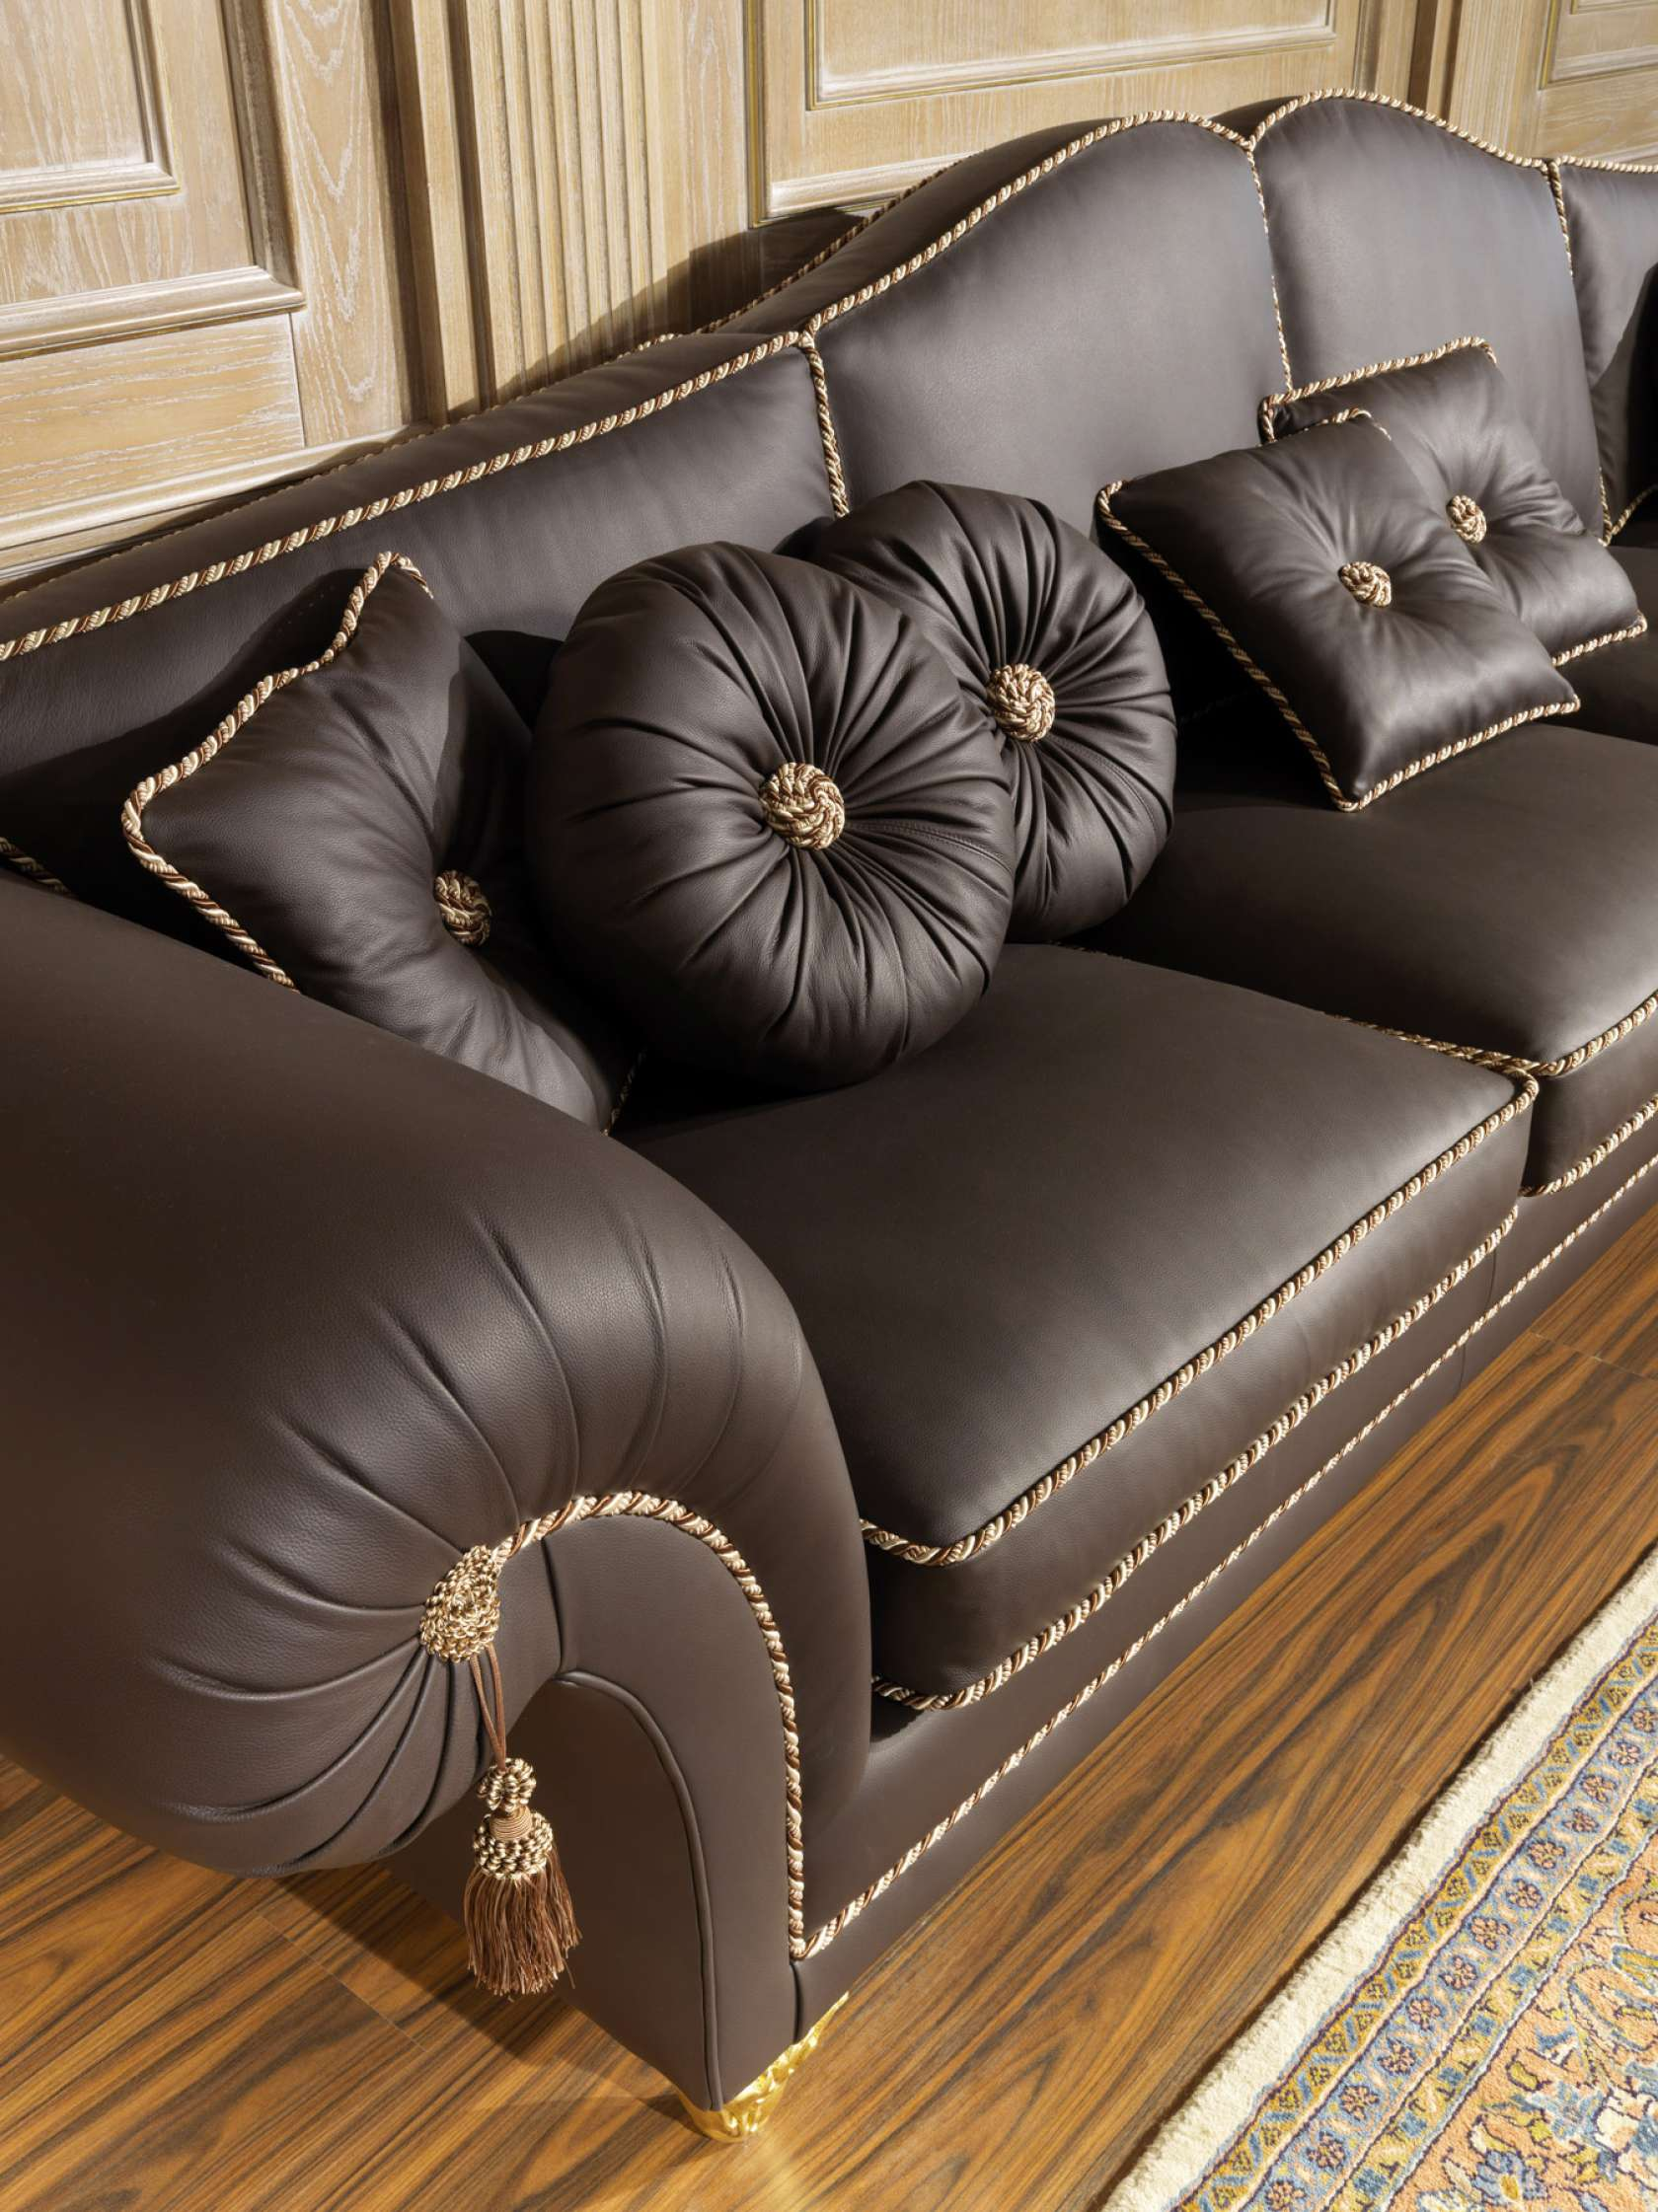 Divani Di Lusso In Pelle.Divano Di Lusso In Pelle Majestic Vimercati Classic Furniture